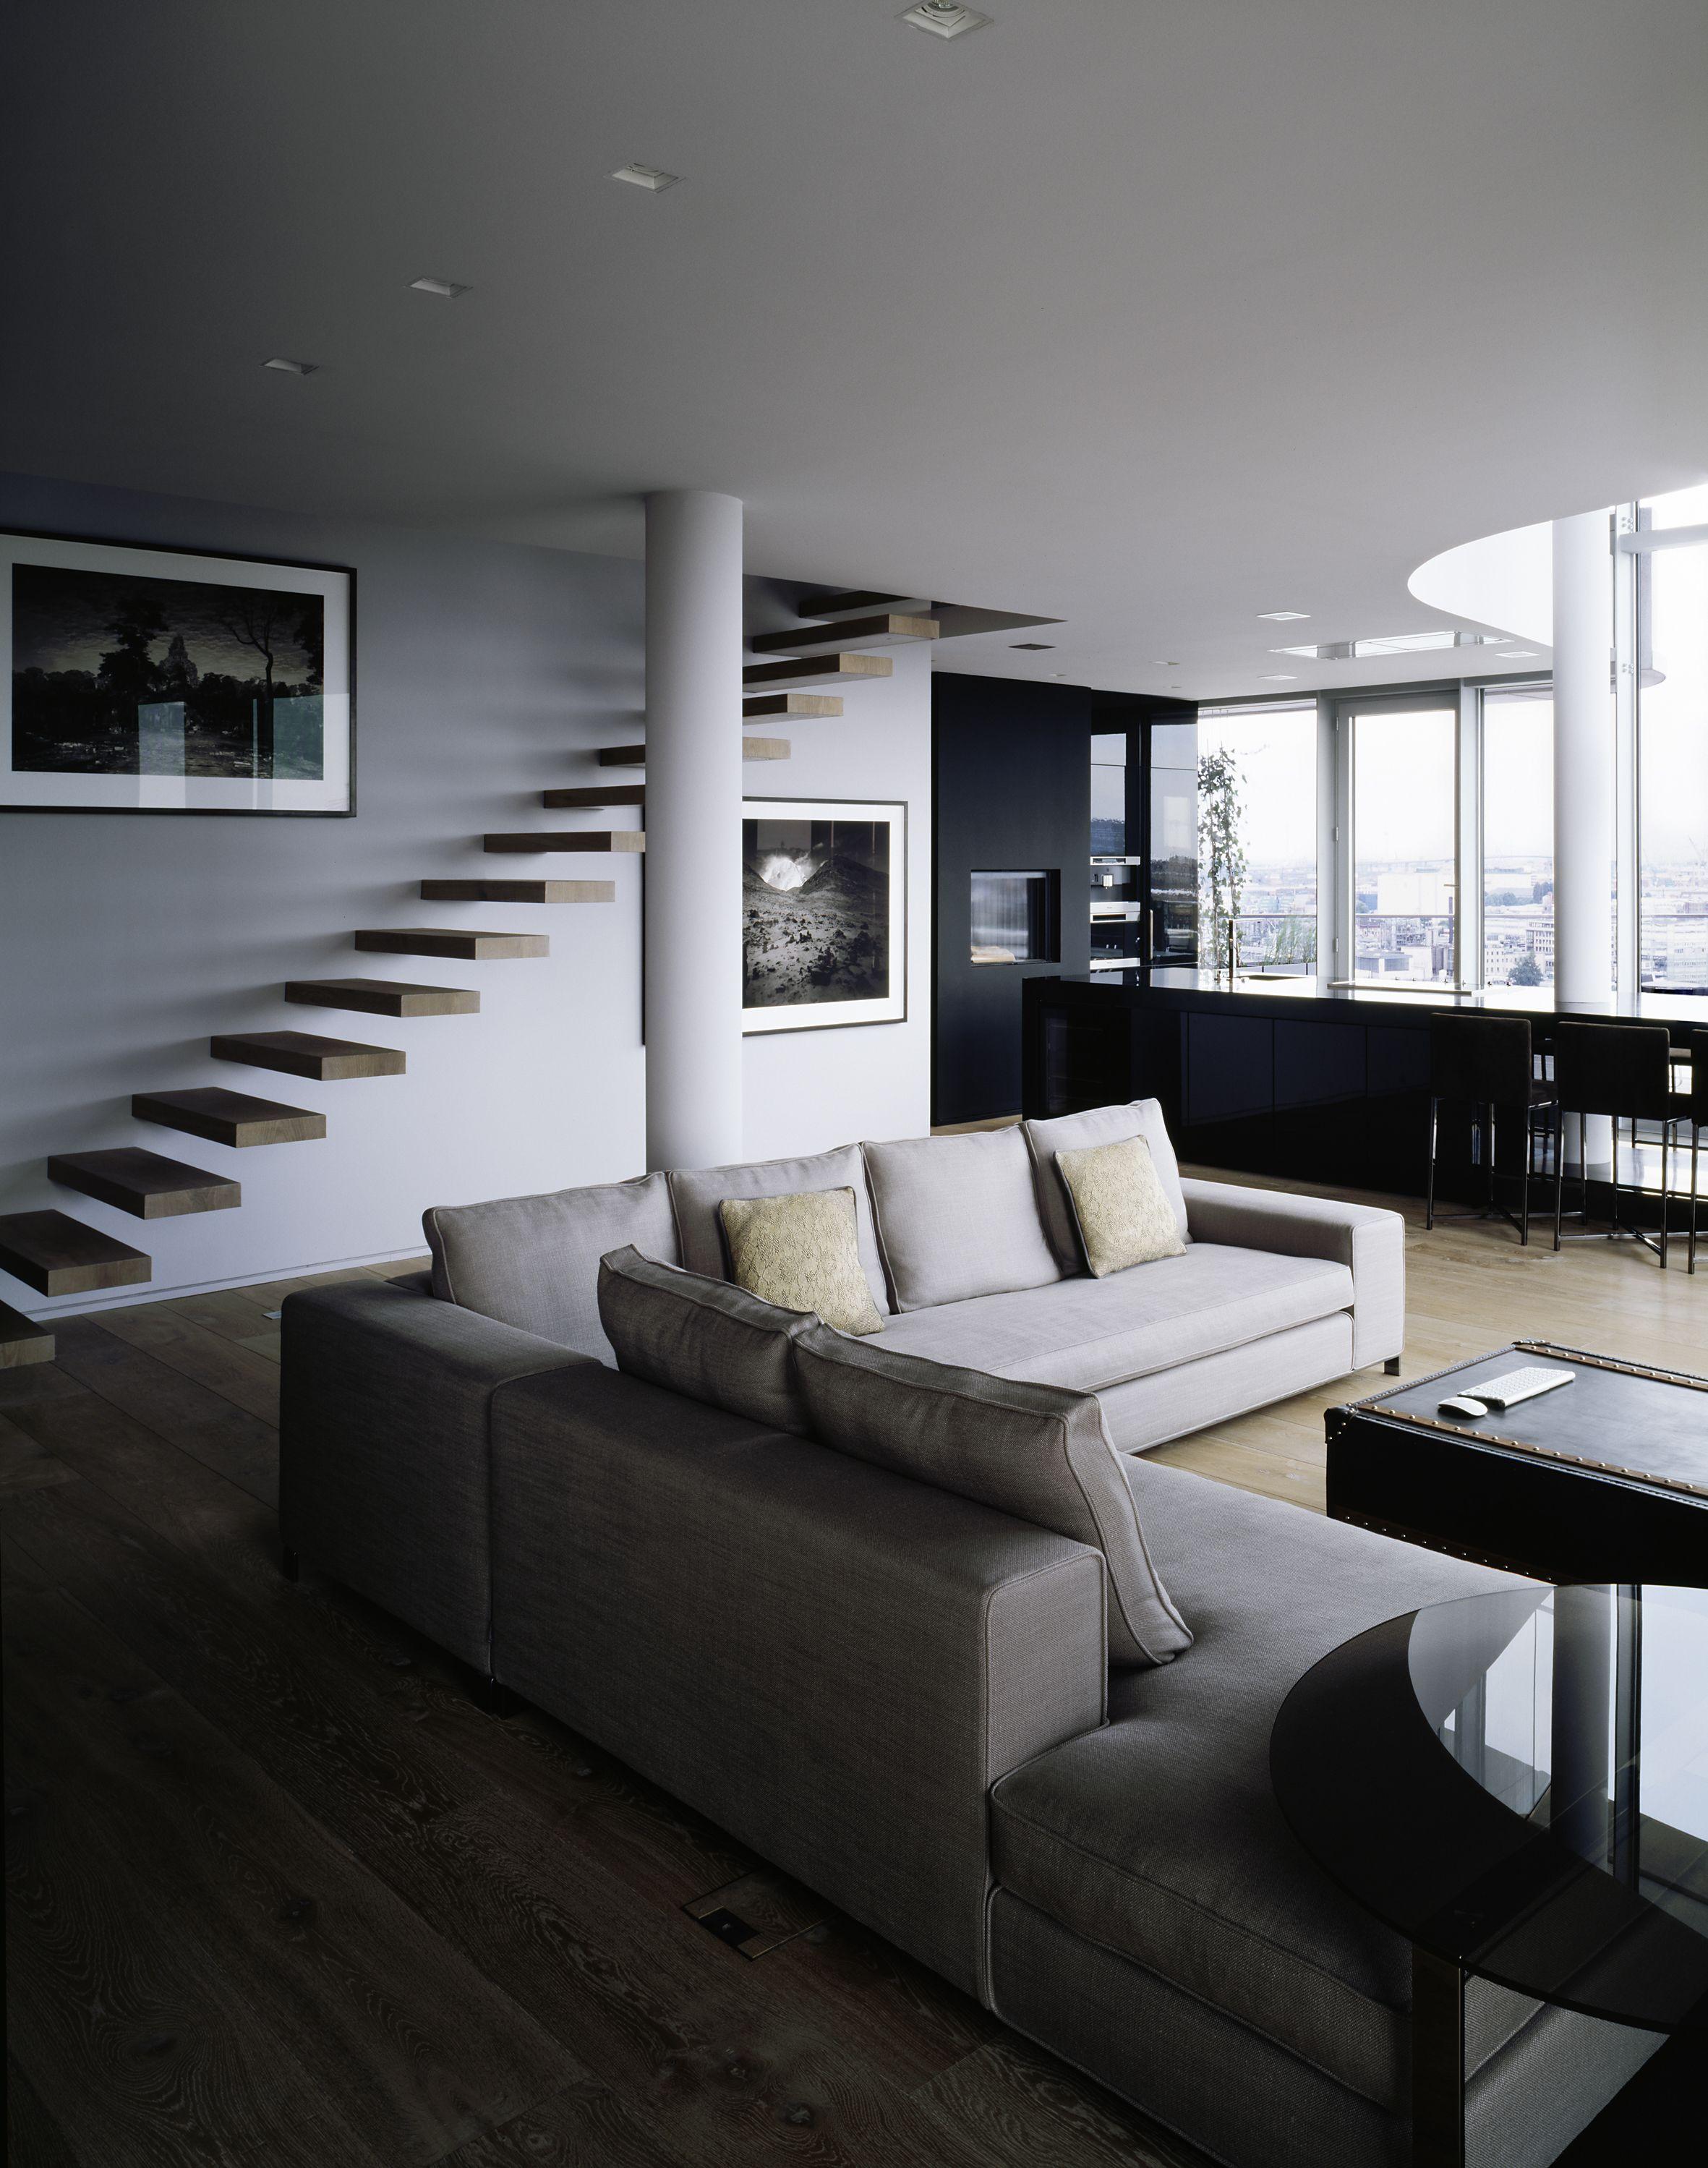 Hamburg Germany, Home Decor Ideas, By, Tower